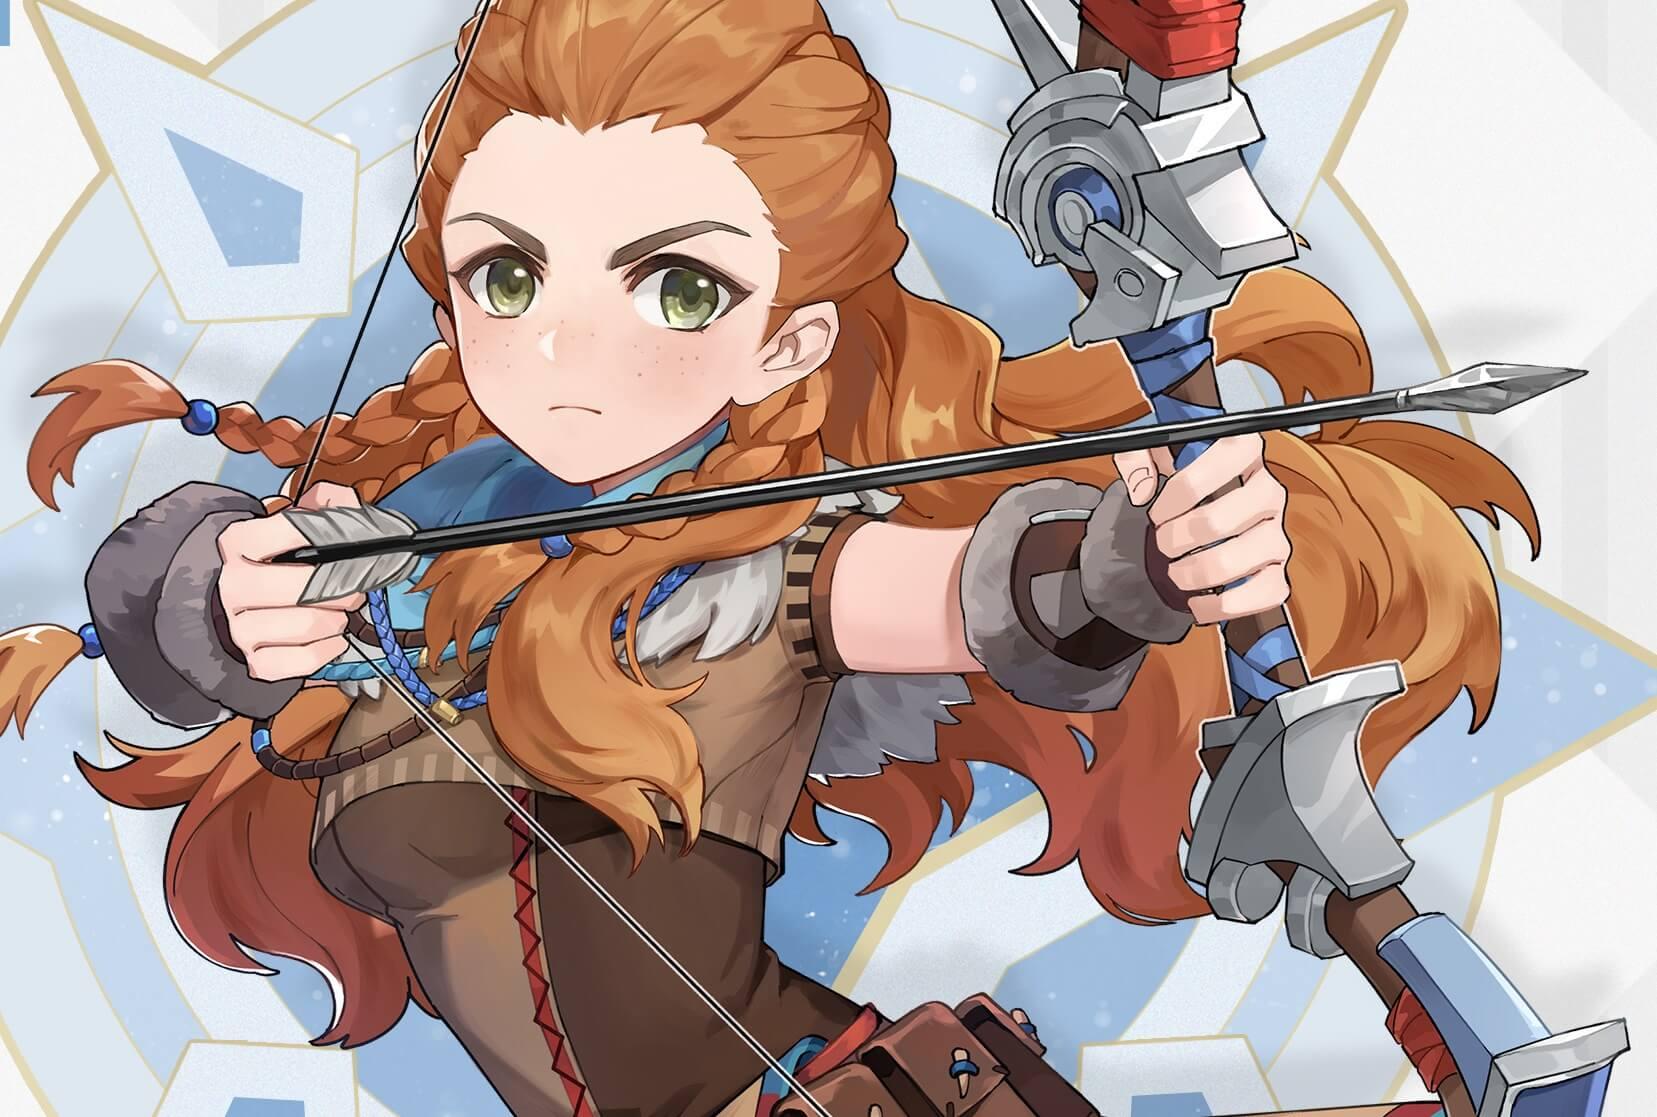 Aloy (Horizon Zero Dawn) llega a Genshin Impact como personaje jugable